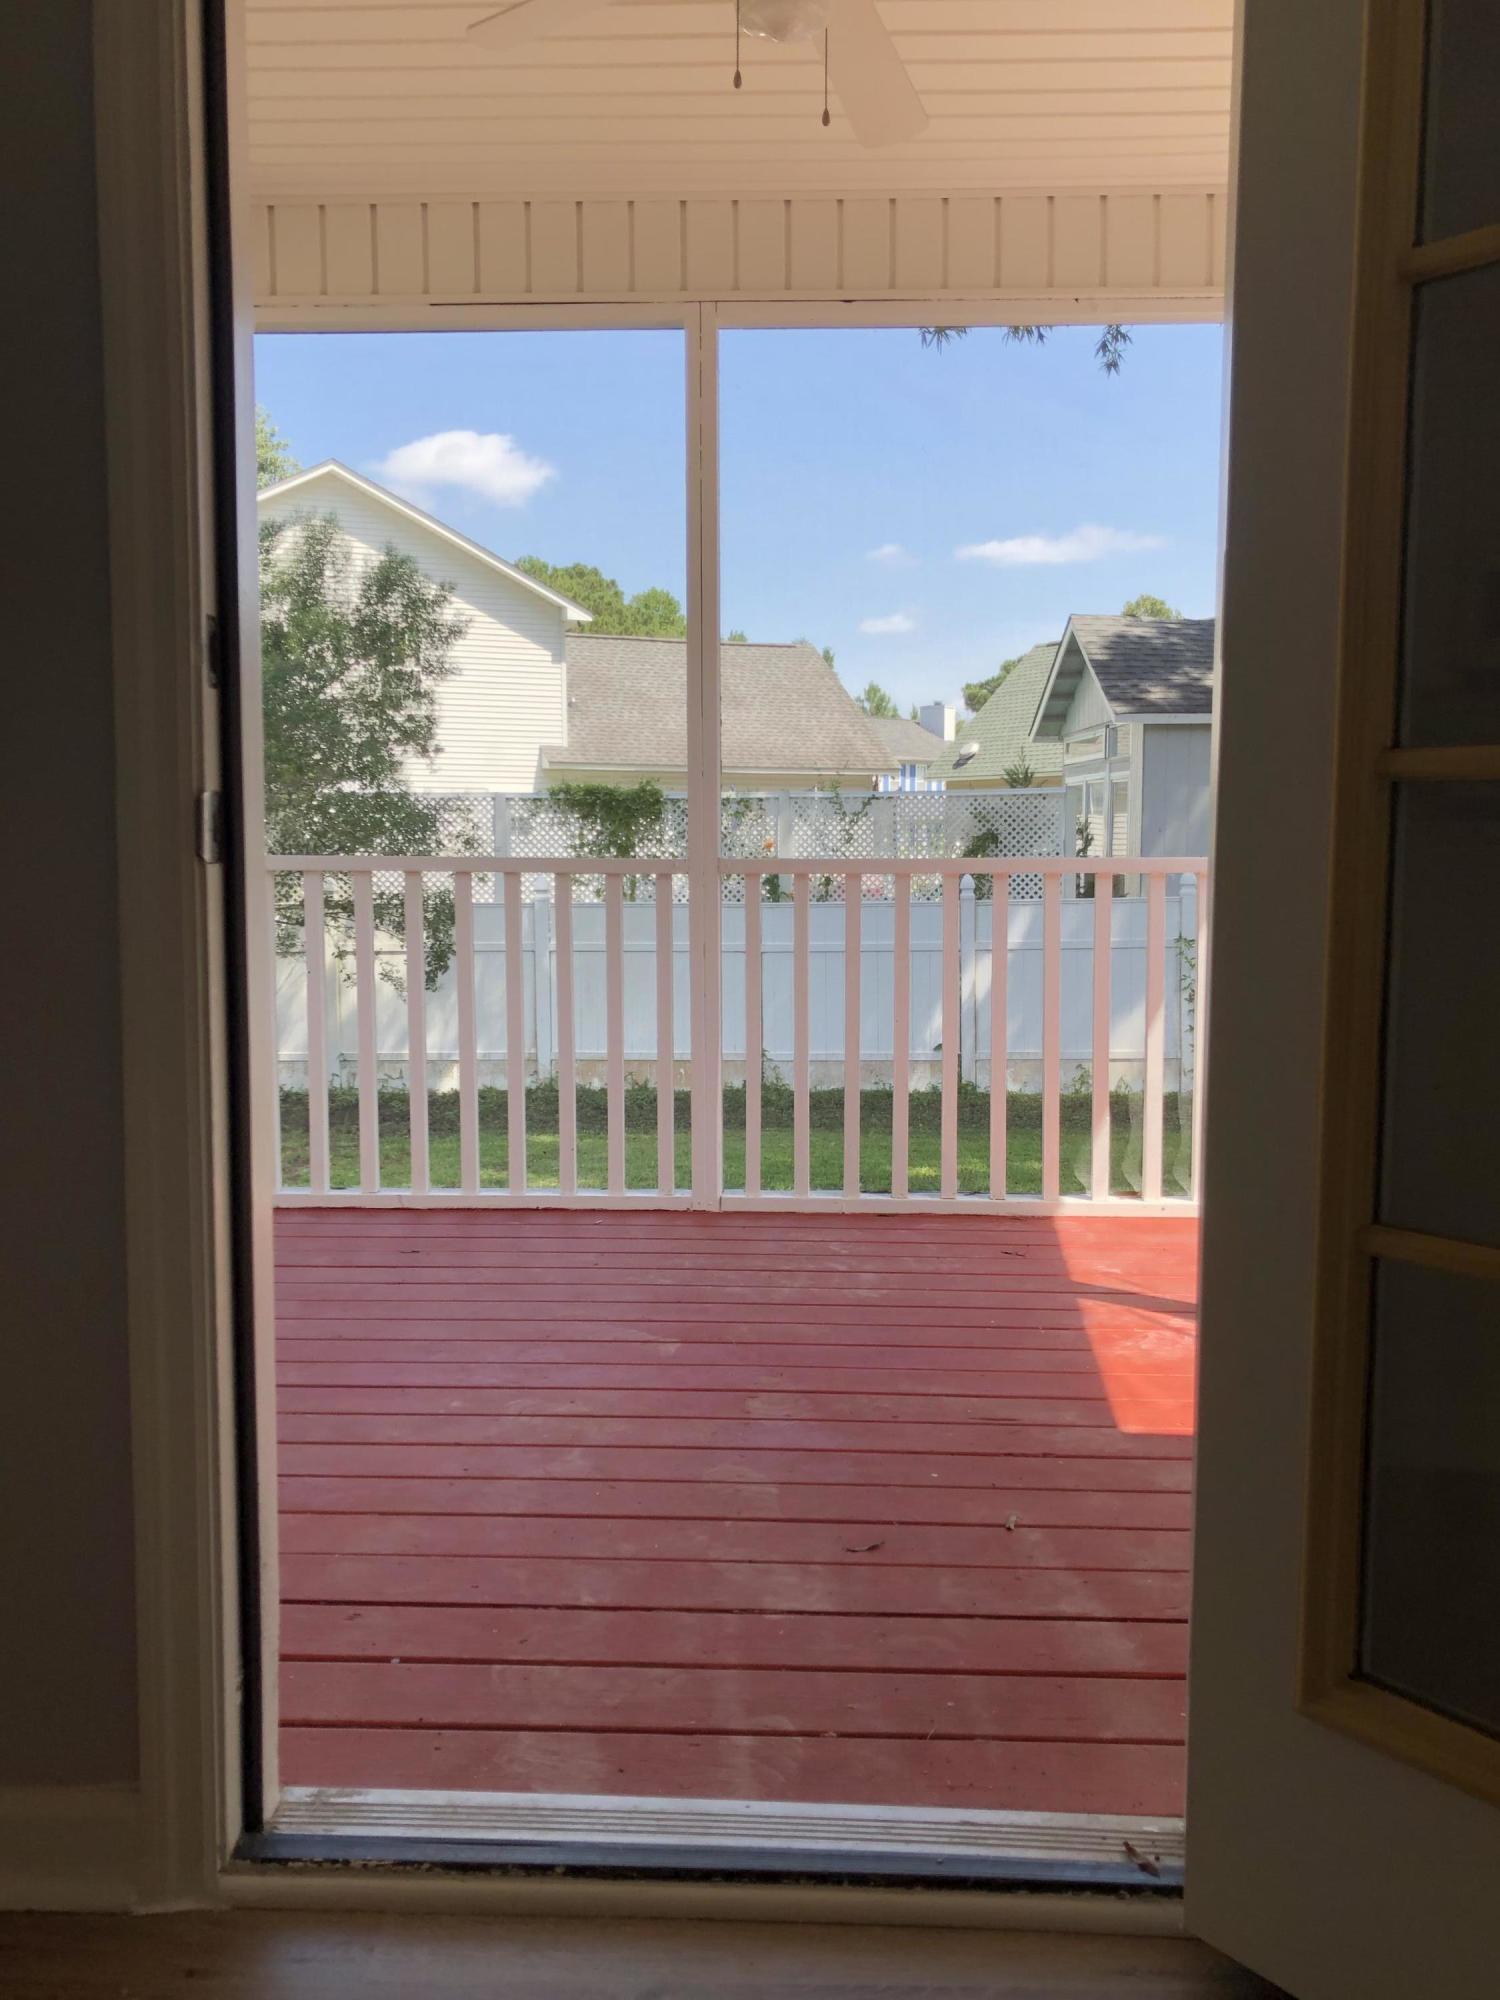 Plantation Point Homes For Sale - 6656 Bent Creek, North Charleston, SC - 1